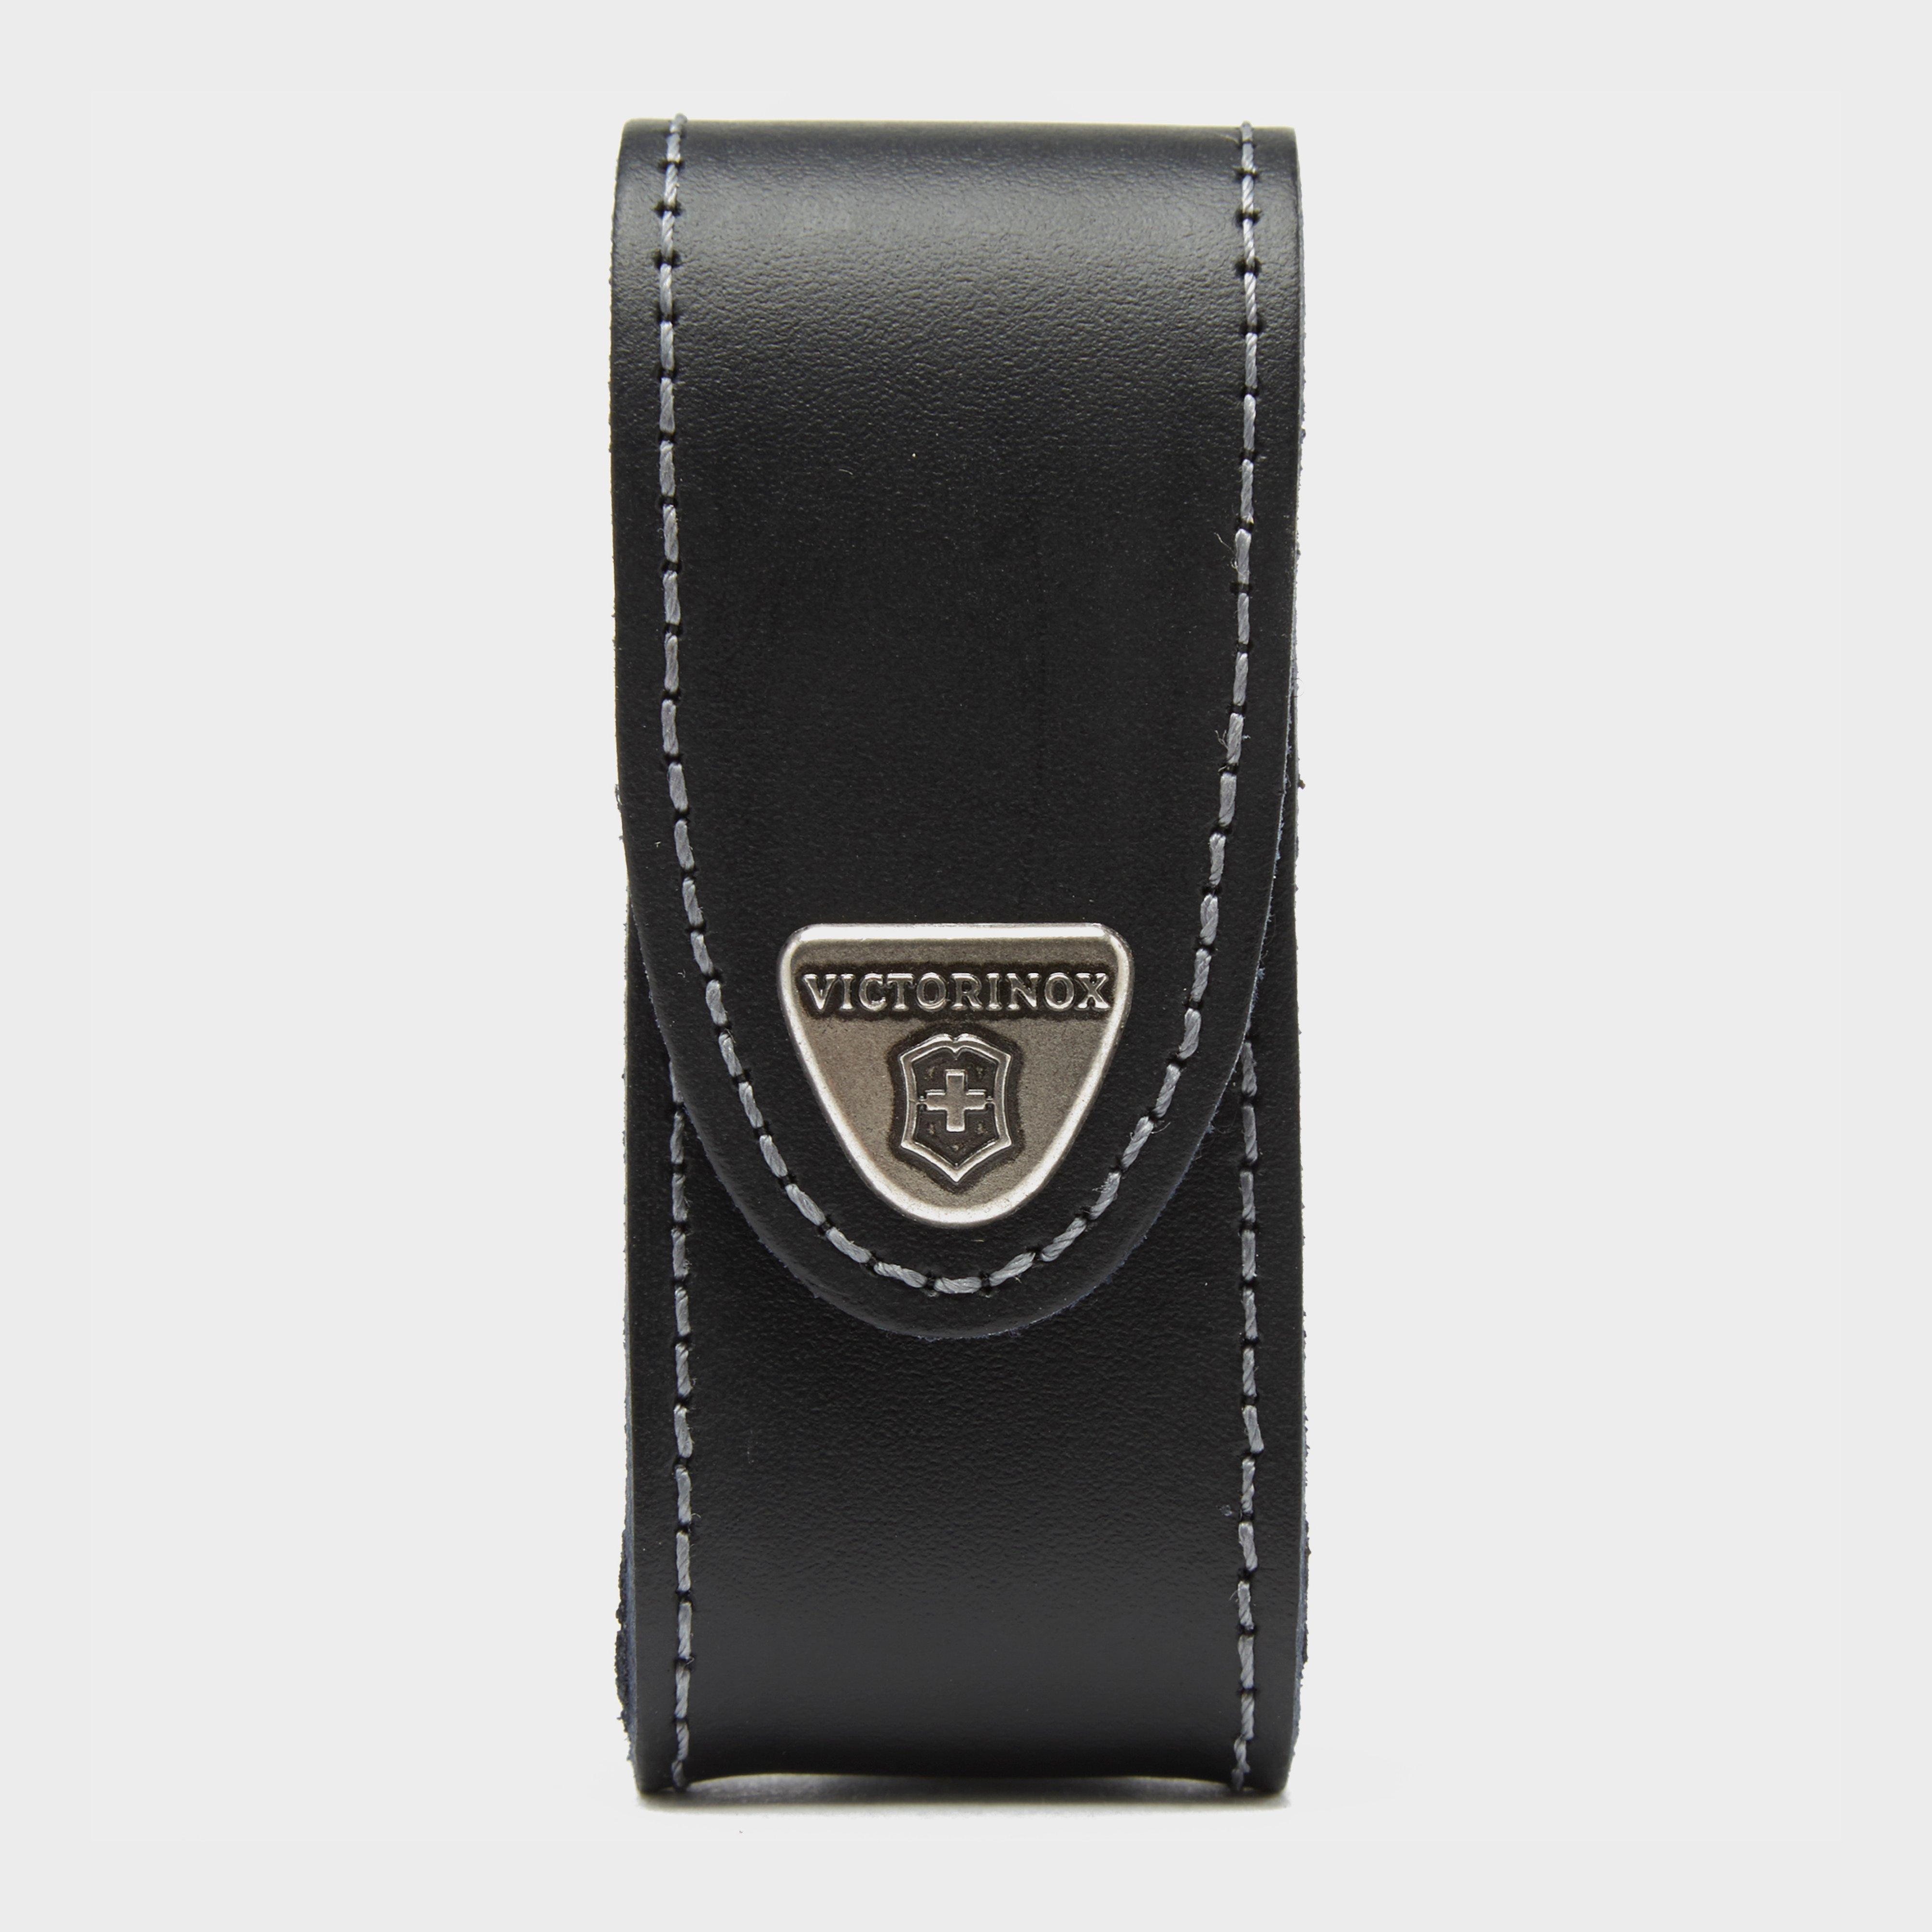 Victorinox Victorinox 2-4 Layer Leather Belt Pouch - Black, Black